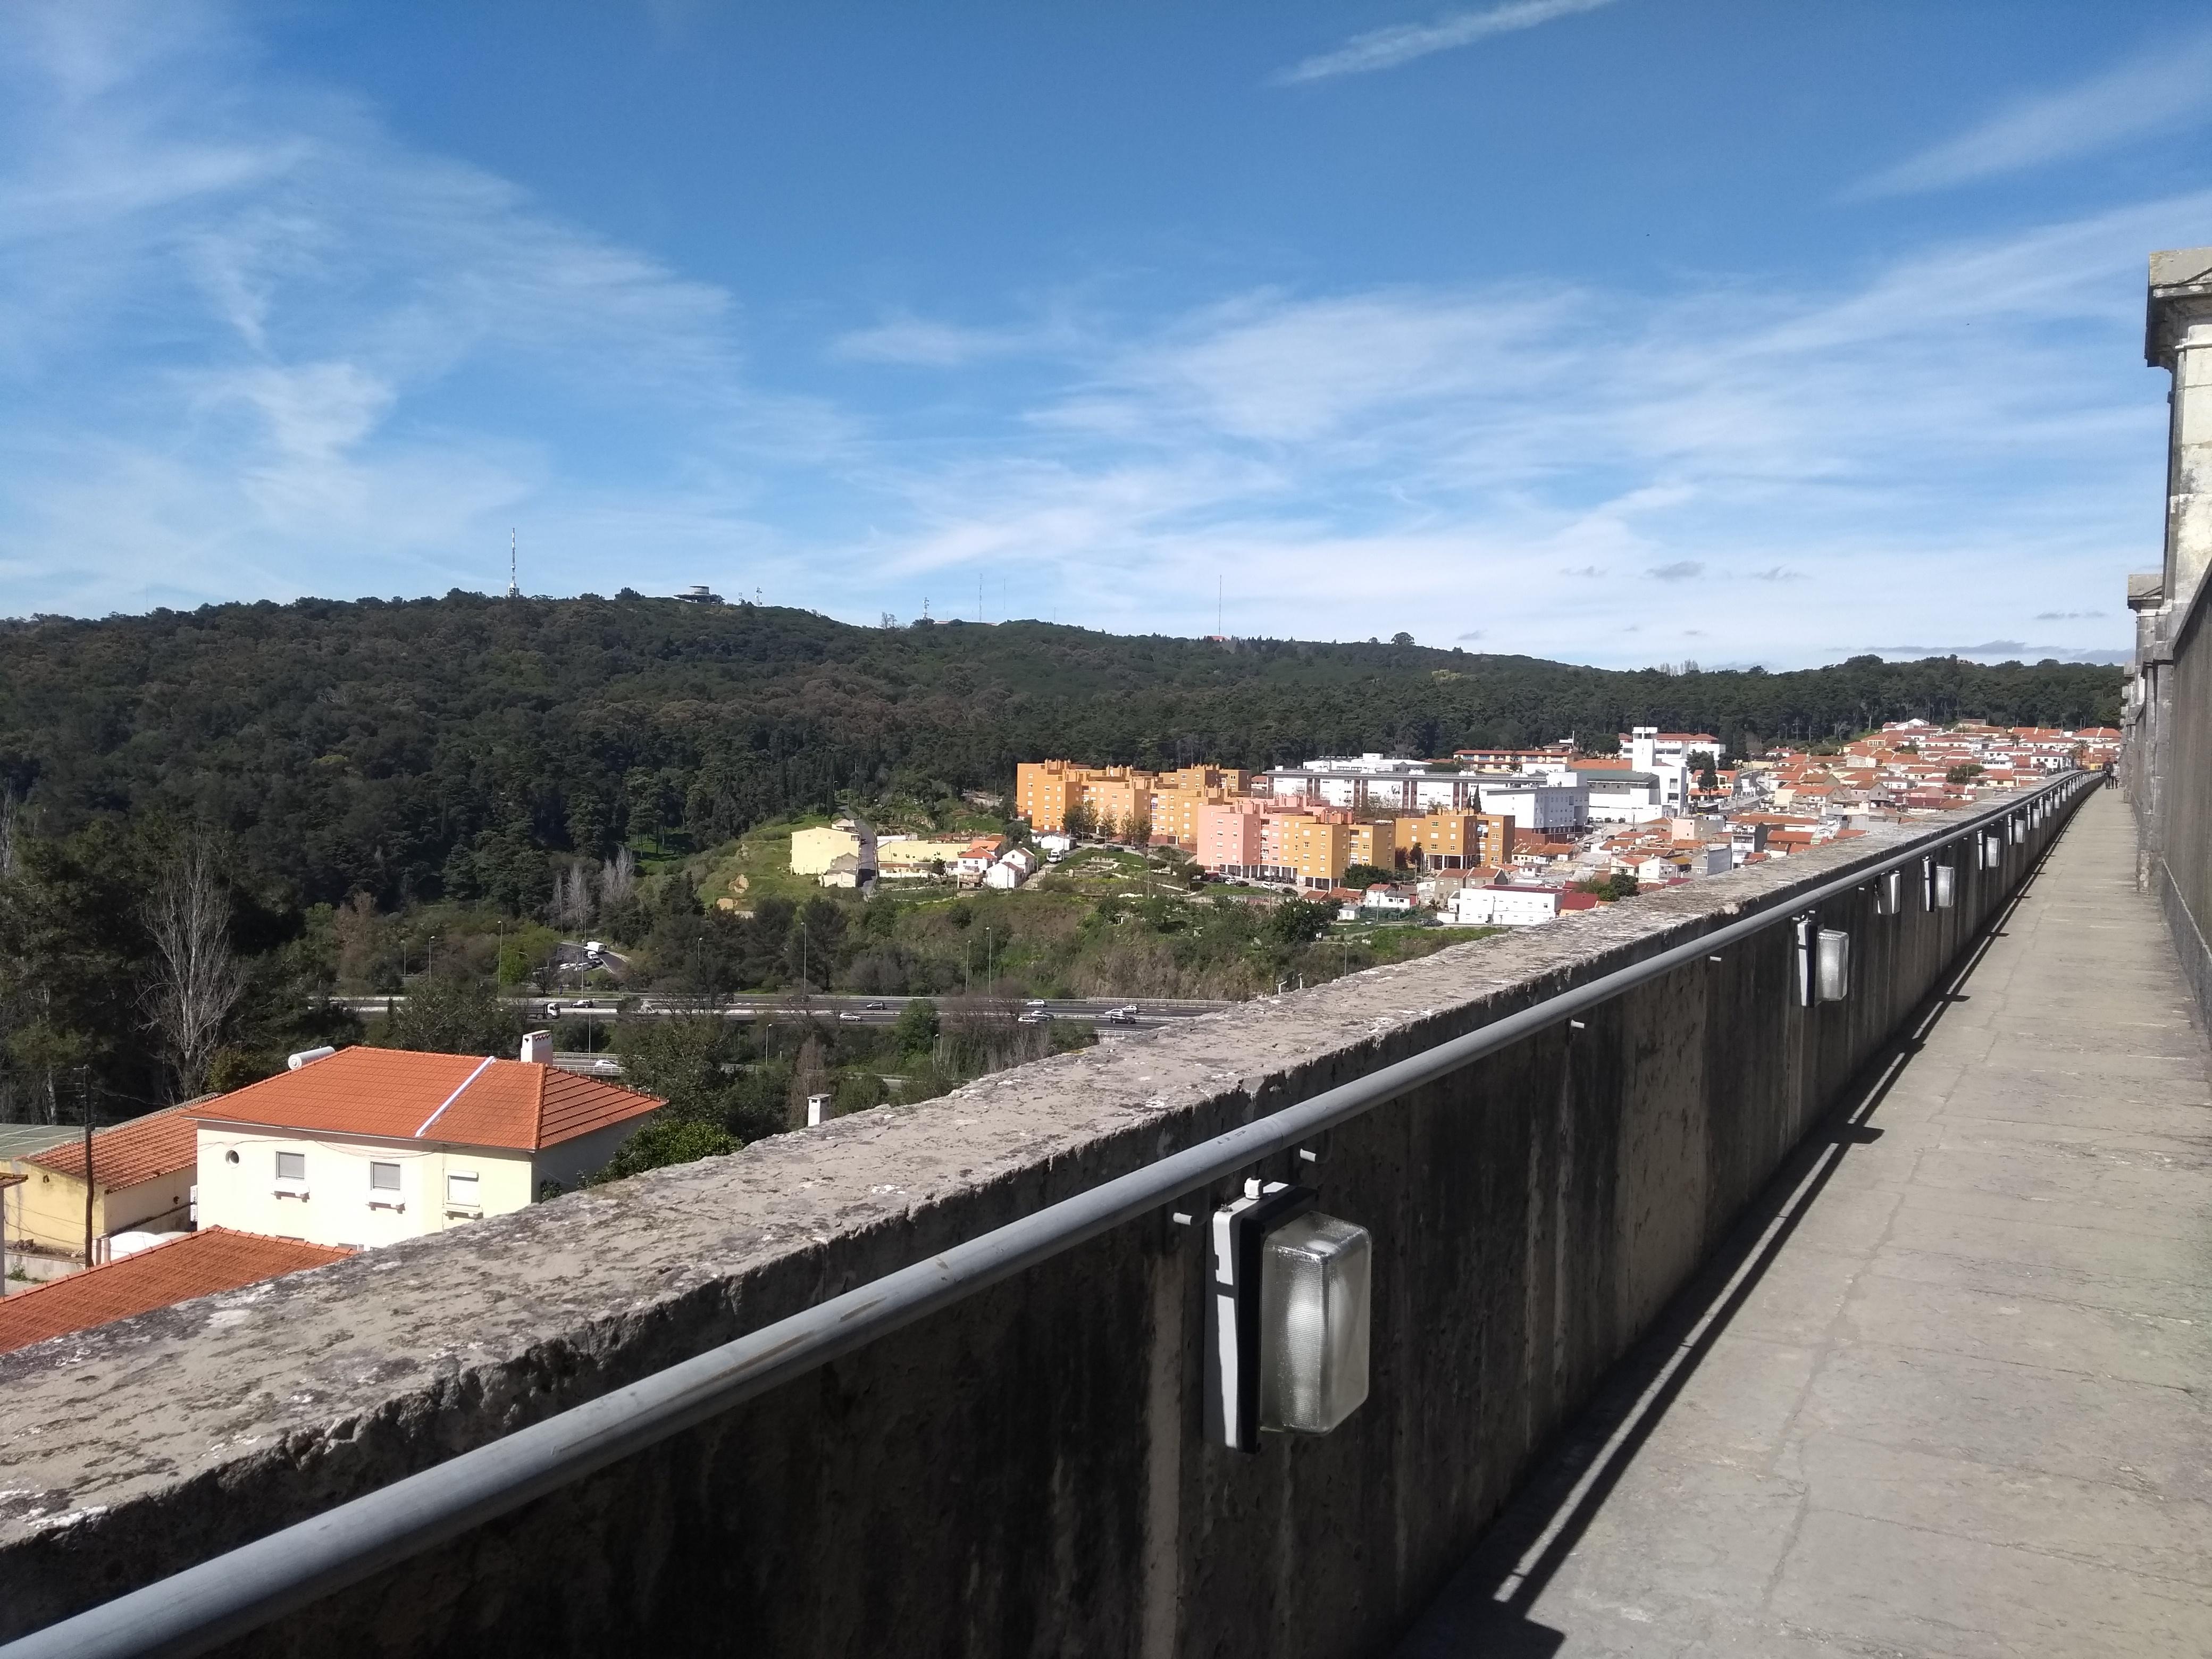 aguas livres aqueduct lisbon photograph,lisbon photograph,travel and talk